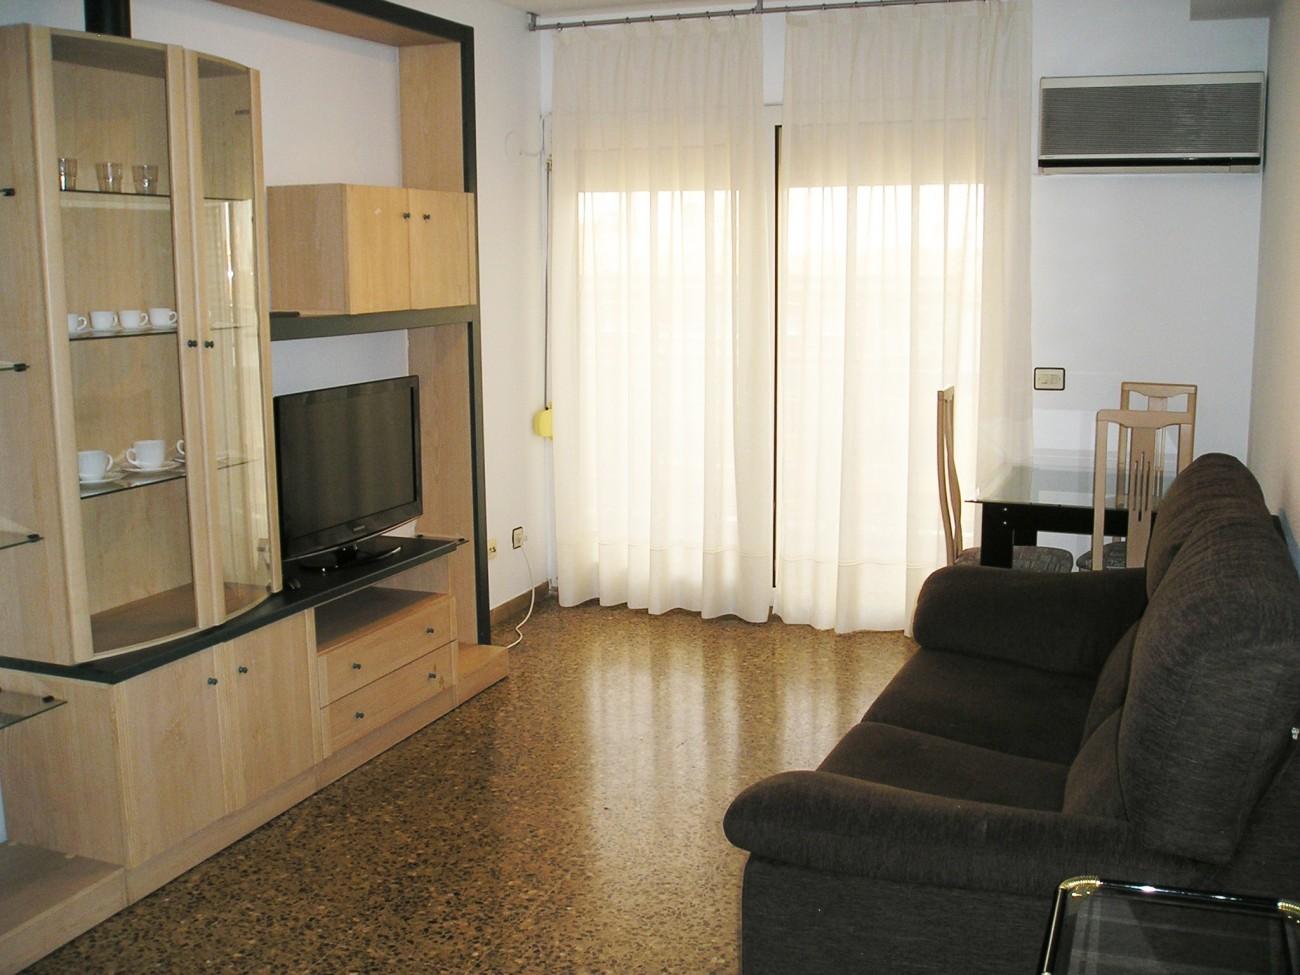 Zaragoza Centro 3000 Apartamento 3 PAX - Vakantiehuis